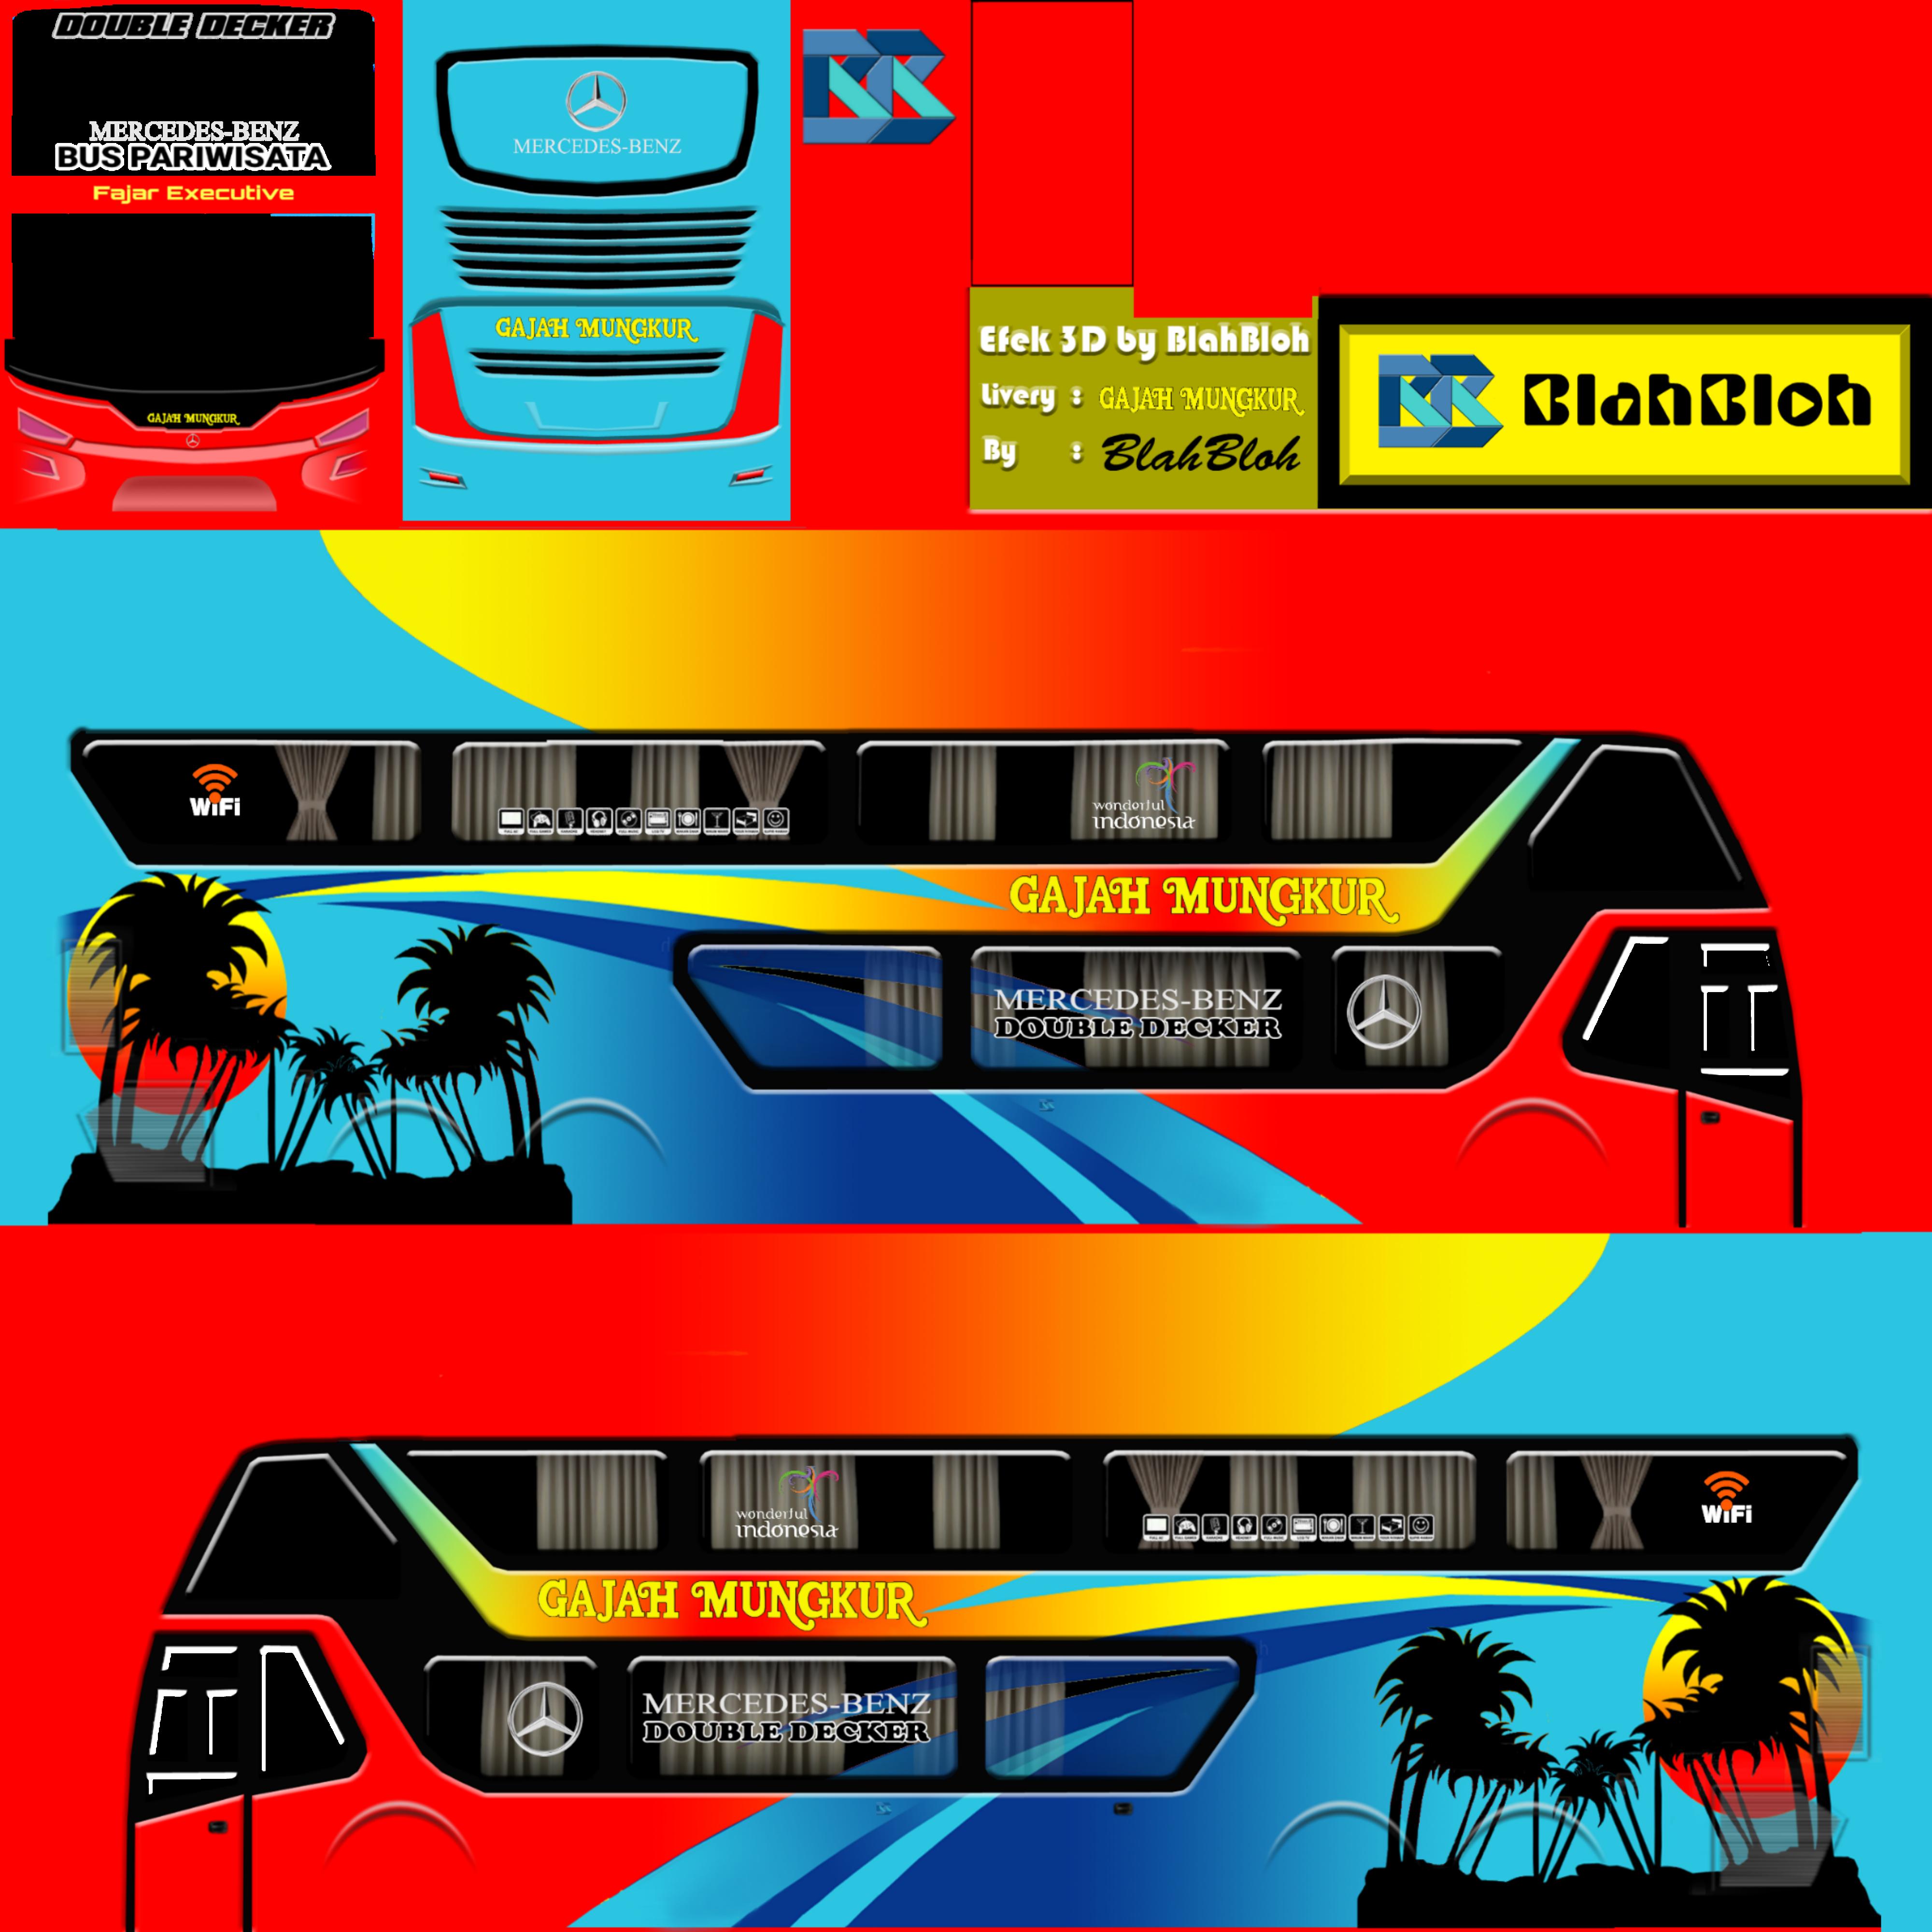 30 Livery Bussid Bimasena Sdd Terbaru Kualitas Jernih Png Konsep Mobil Desain Decal Pariwisata